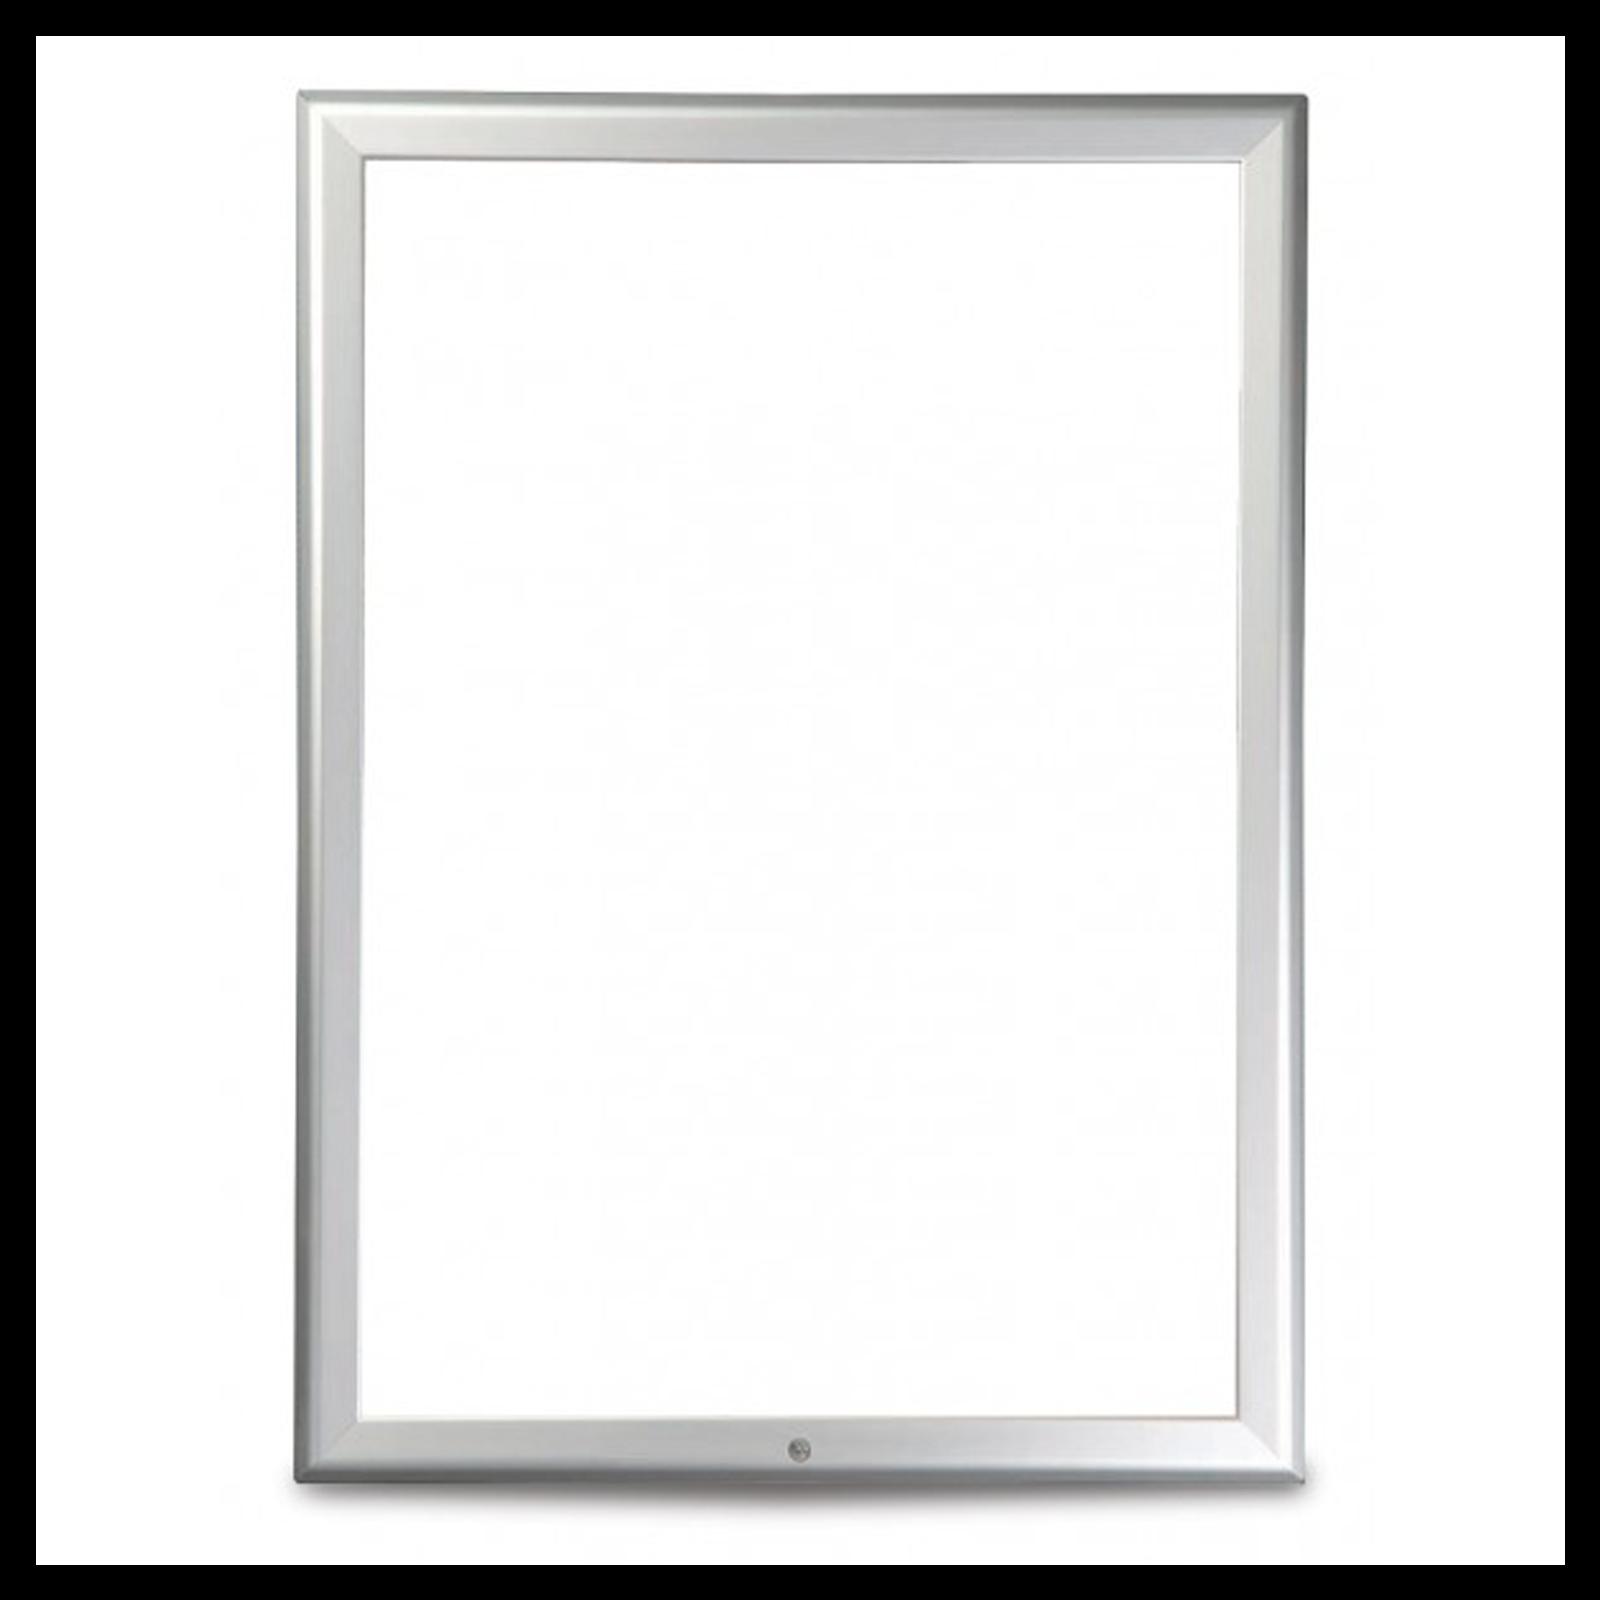 Silver 32mm Lockable Poster Display Snap Frames